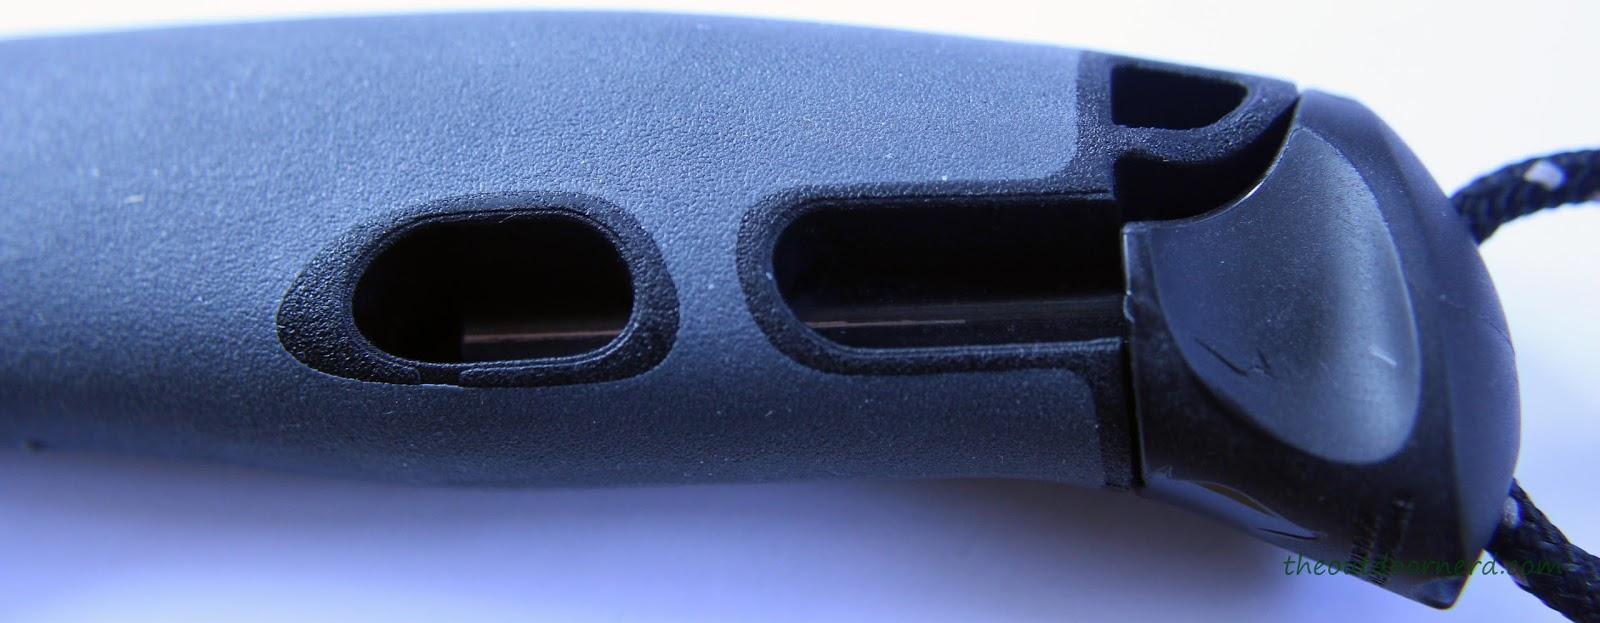 Light My Fire Swedish FireKnife: Closeup Of Handle With FireSteel Cutaway